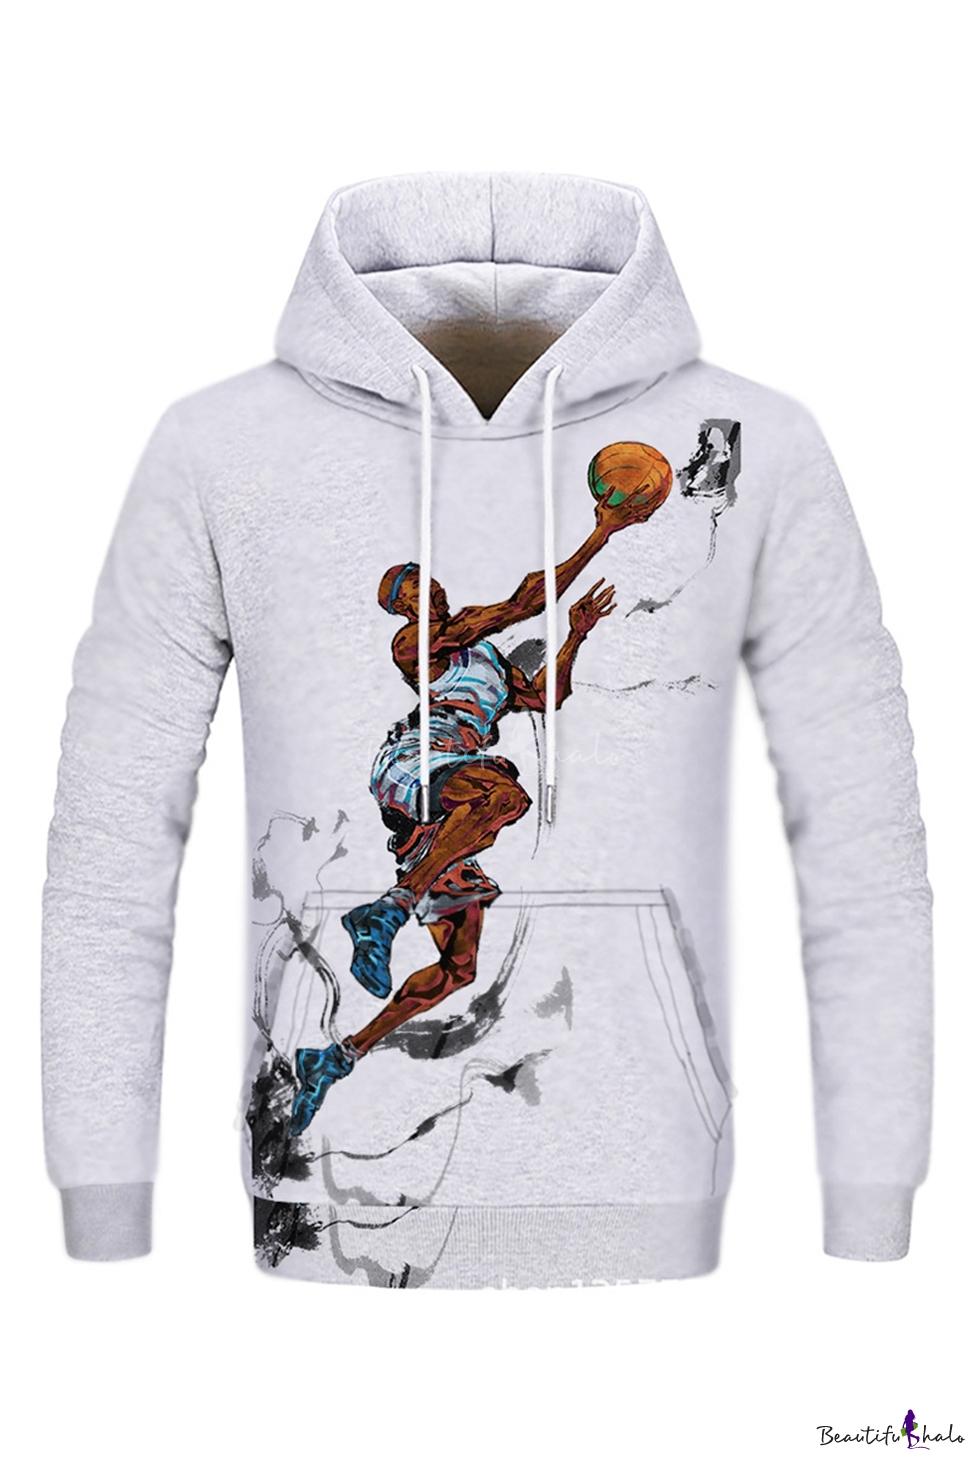 Hot Popular NBA Basketball Player Printed Long Sleeve Gray Drawstring Hoodie with Pocket